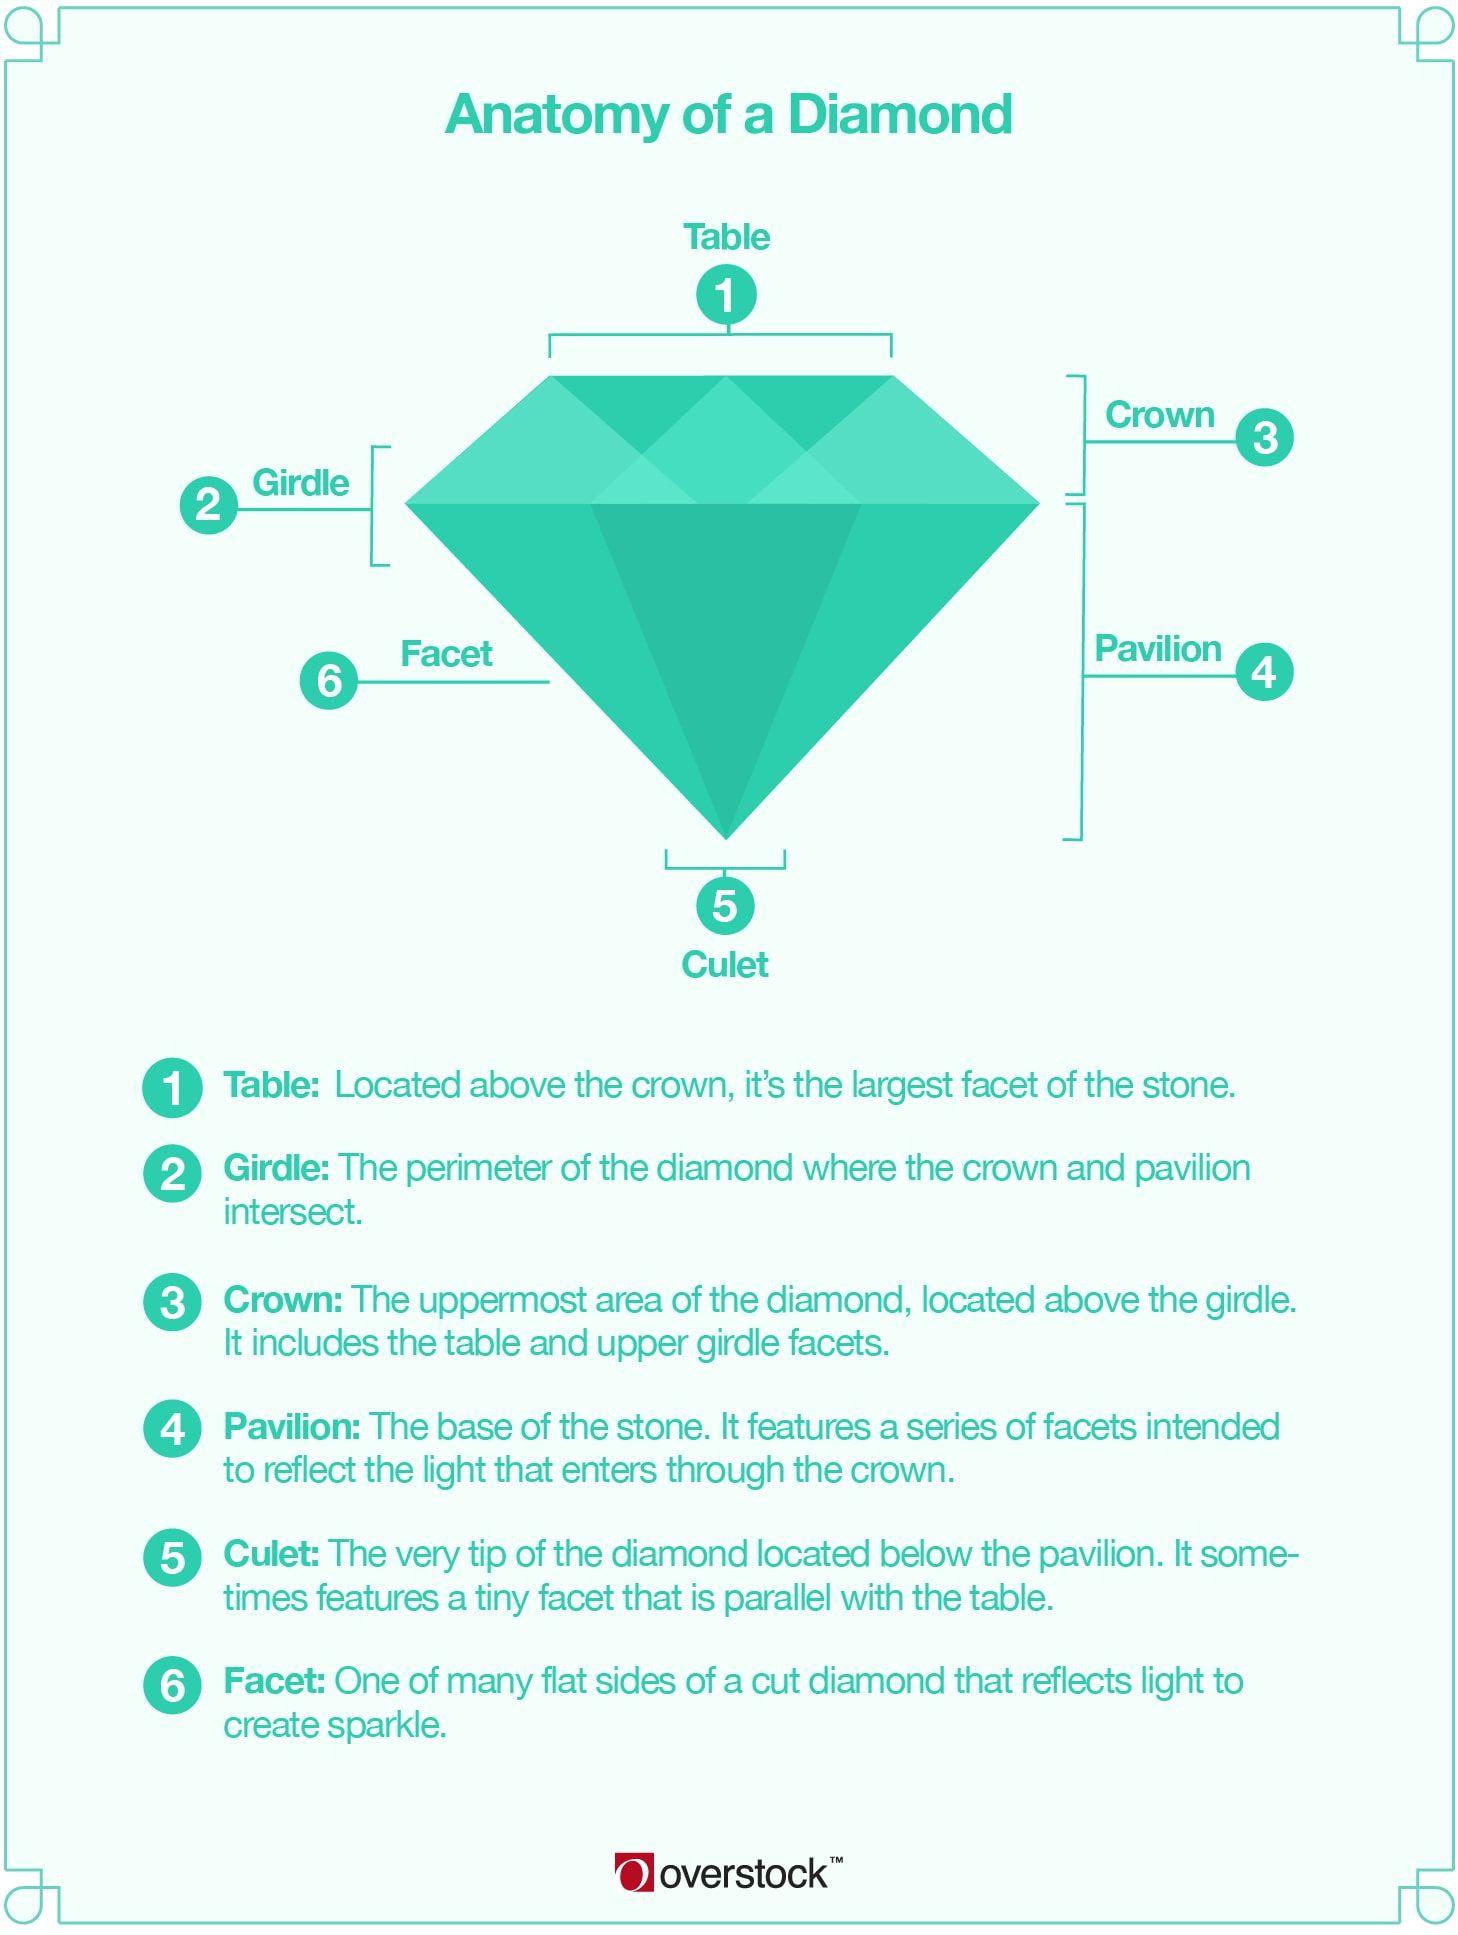 How to Buy a Diamond Engagement Ring | Anatomy, Diamond and Diamond ...